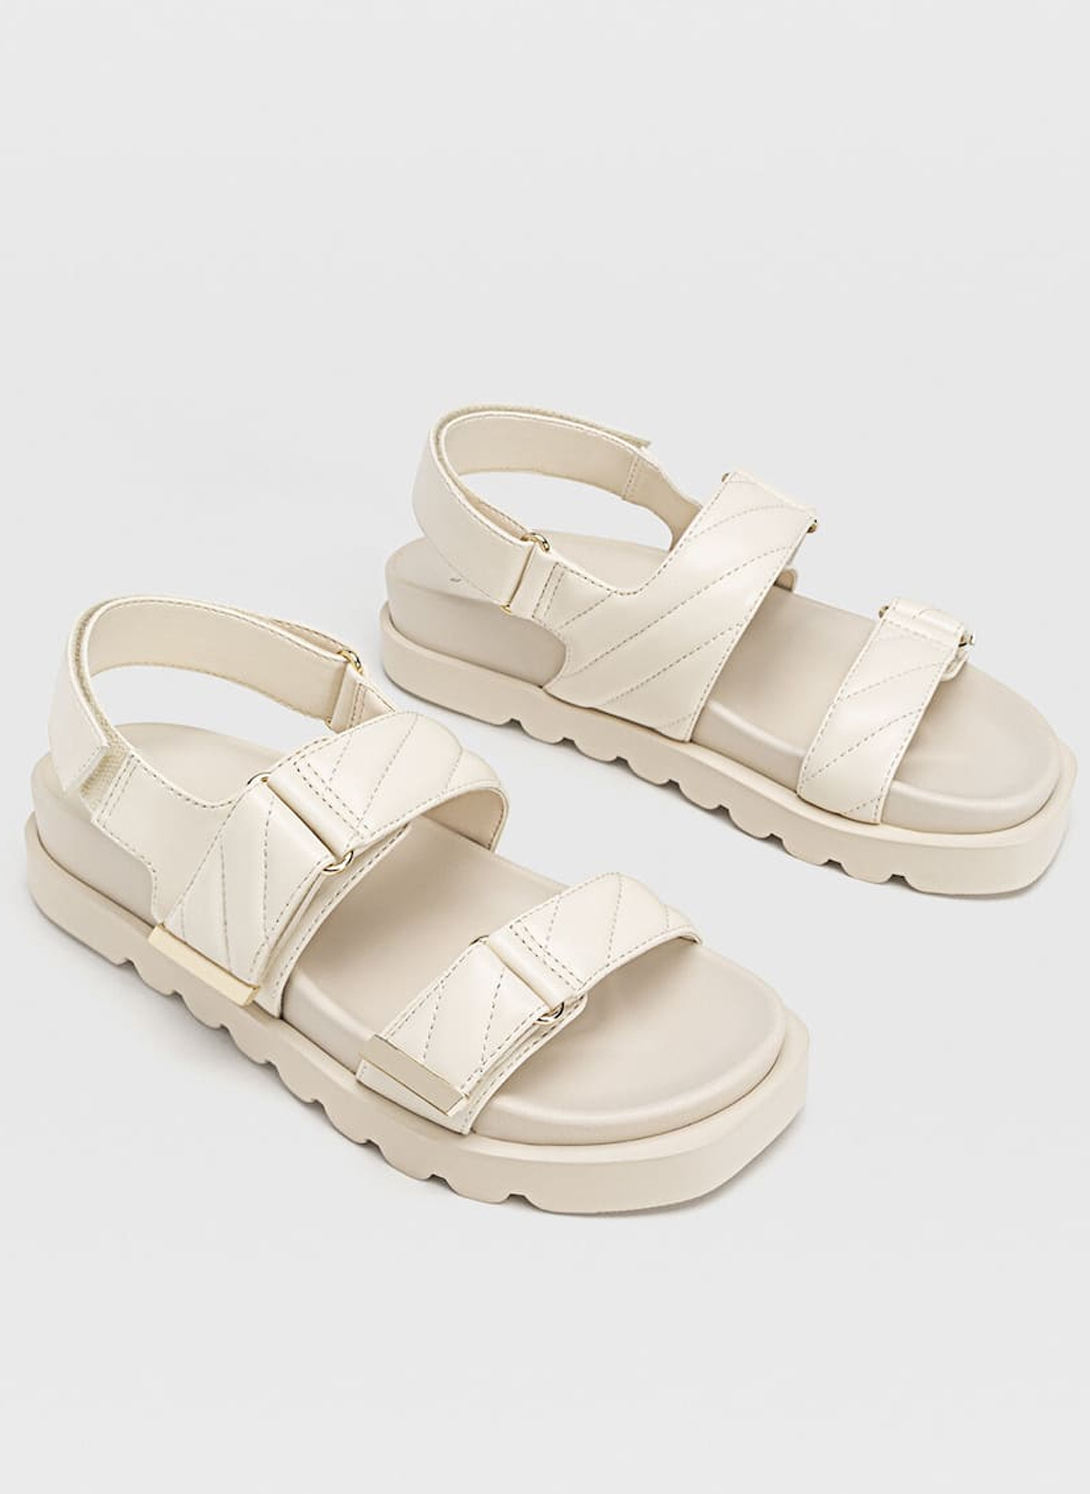 chanel dad sandals dupe beige